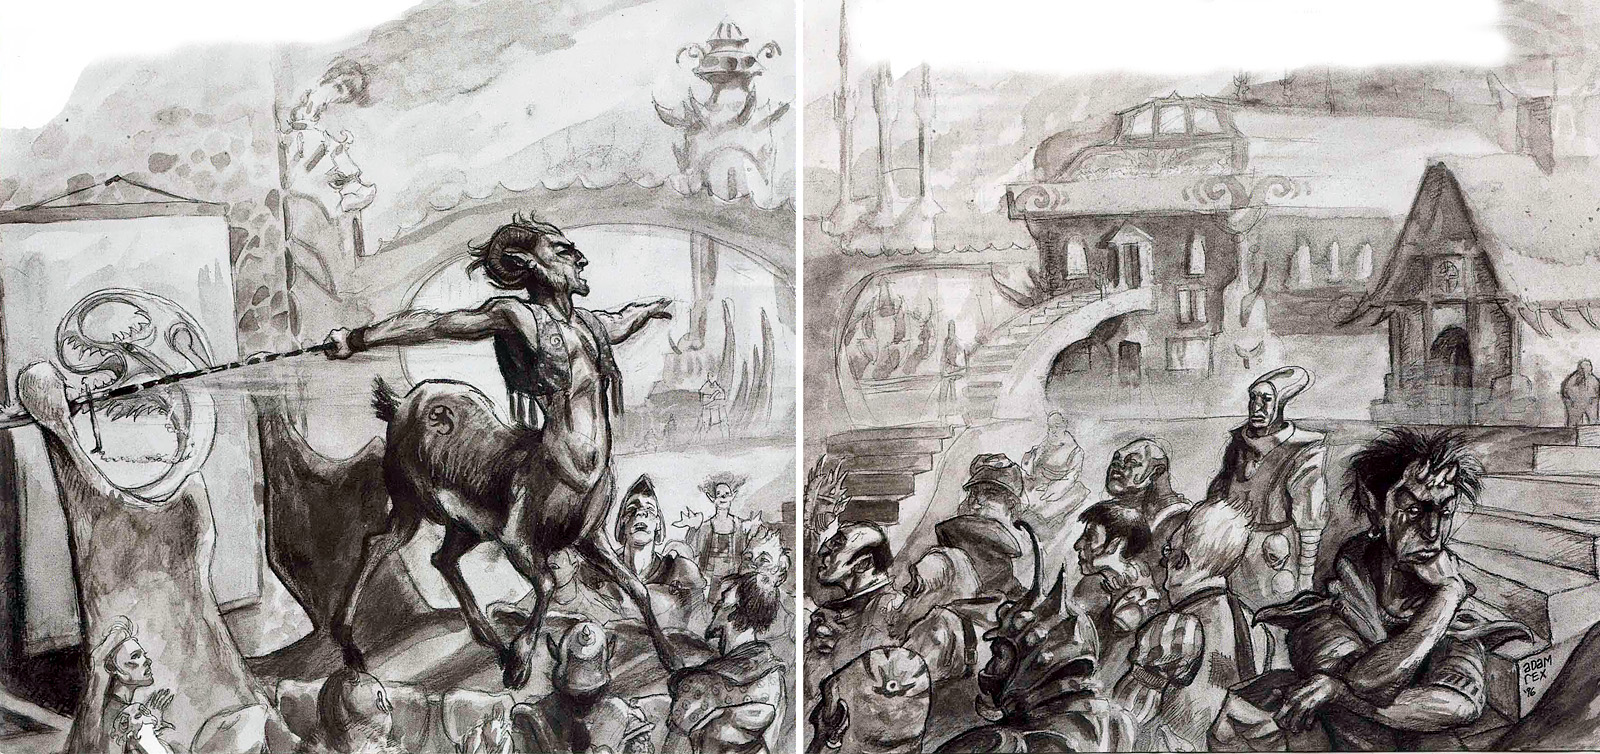 bariaur free league tiefling indept Bariaur della Lega Libera intento a reclutare - by Adam Rex TSR - Hellbound, The Blood War (1996-06) © Wizards of the Coast & Hasbro